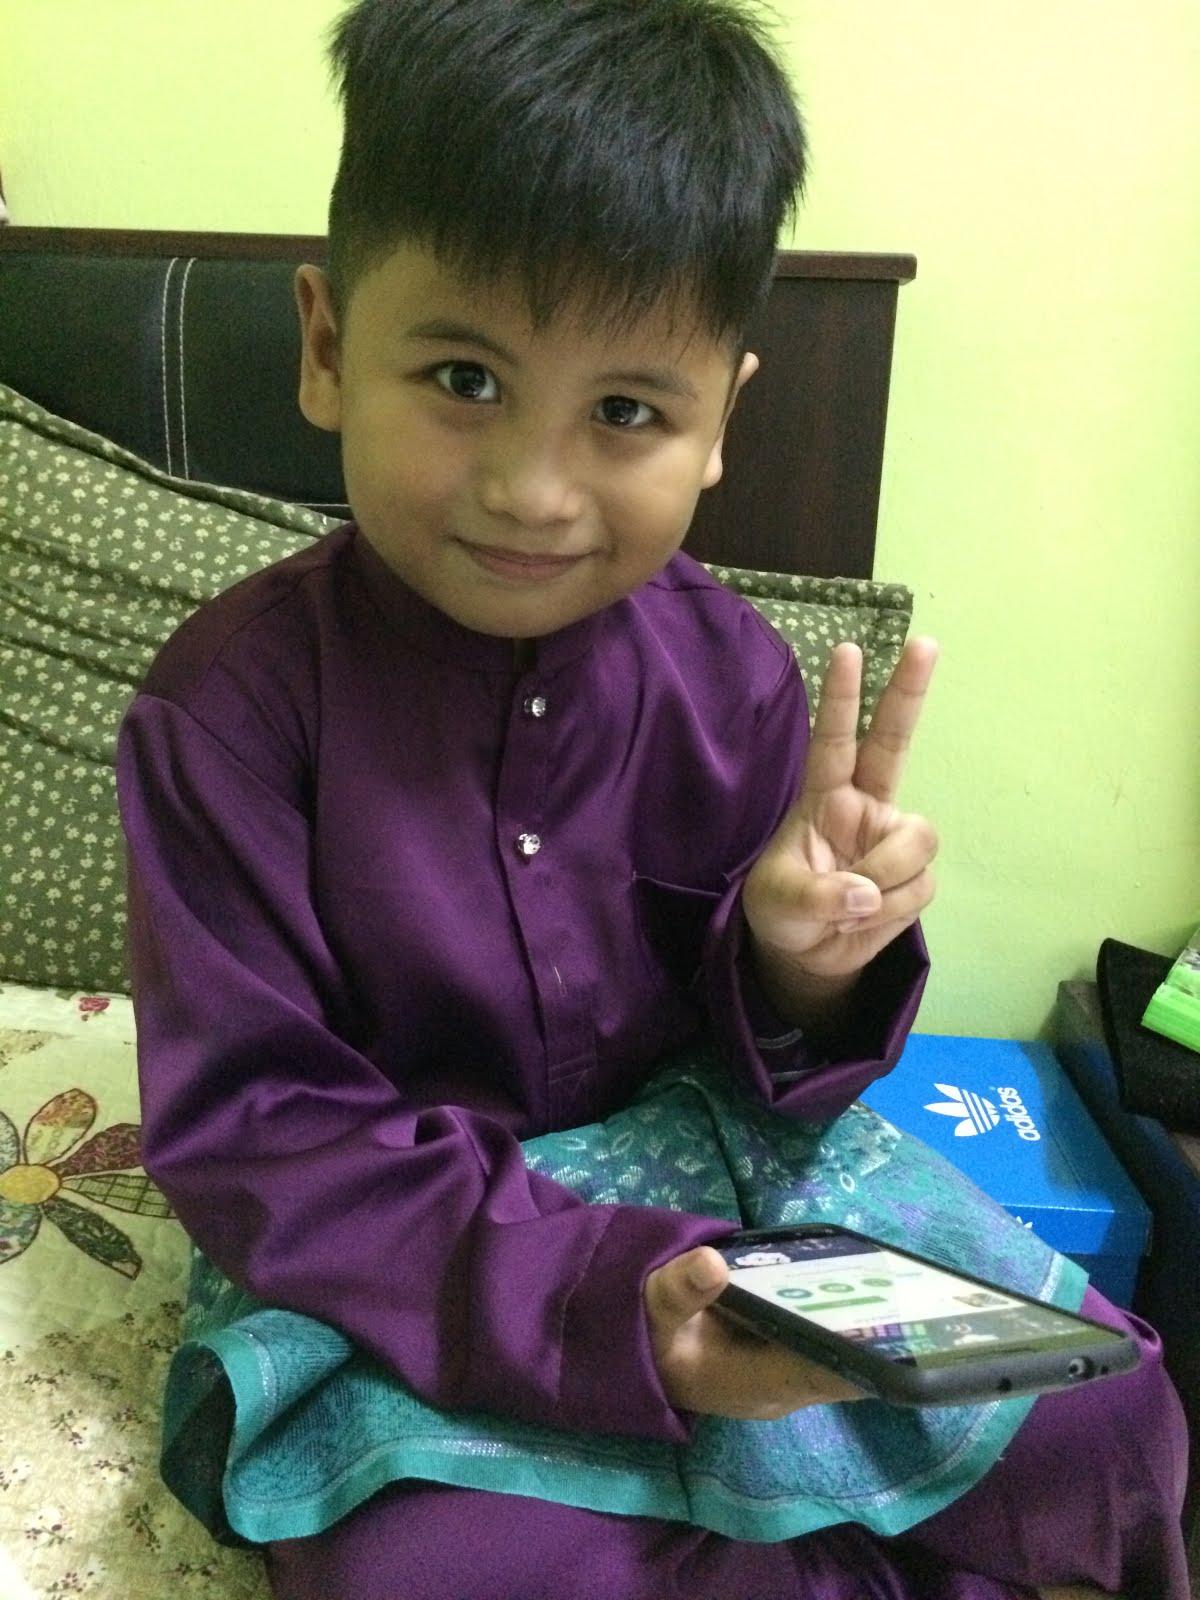 My Emir ukasyah